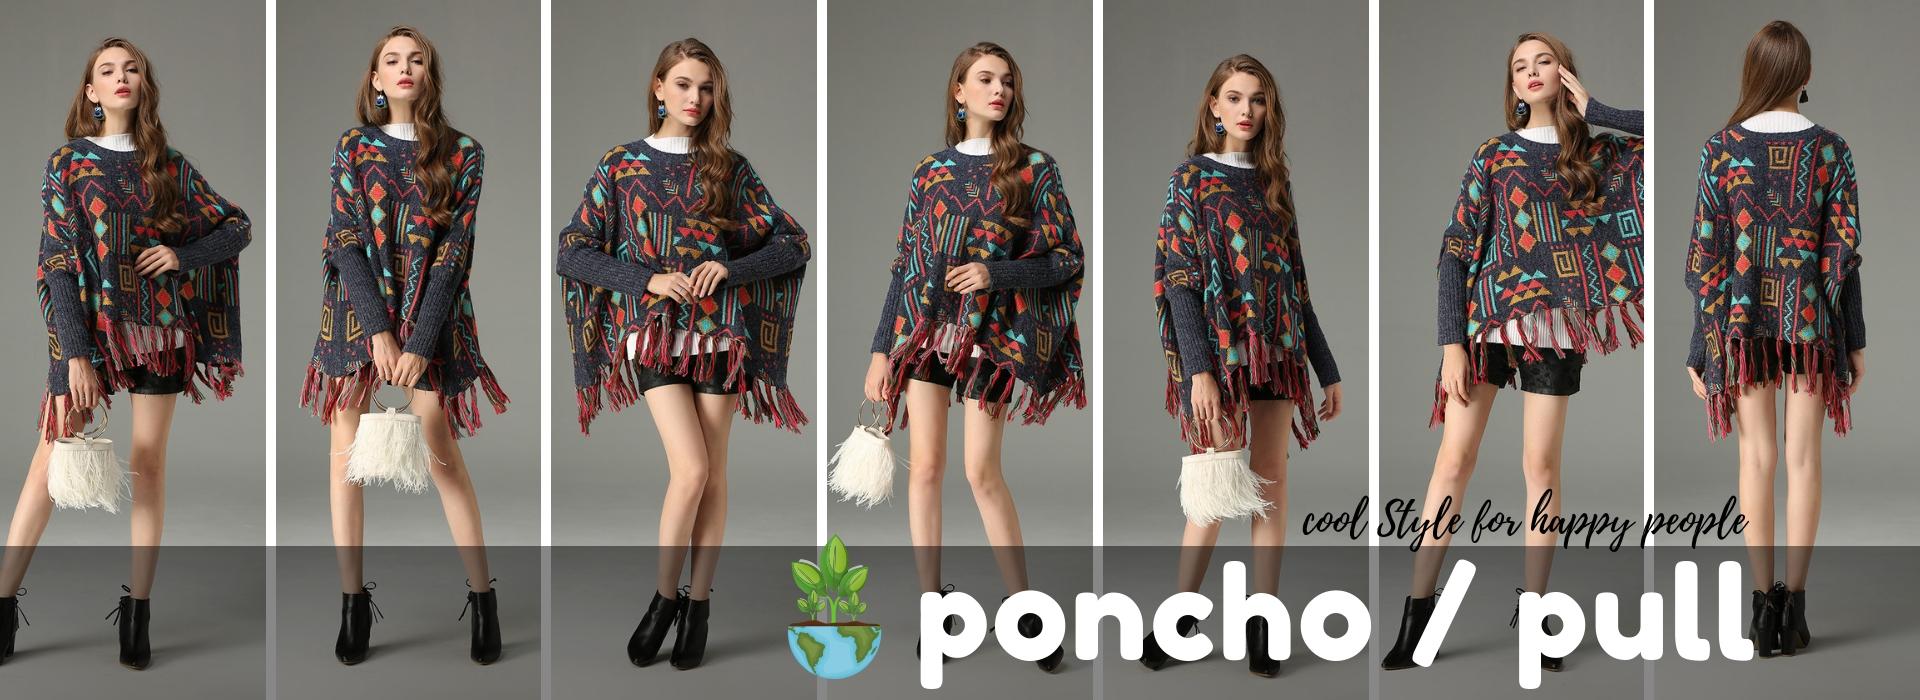 Poncho Pull Bohème Chic Ethnique